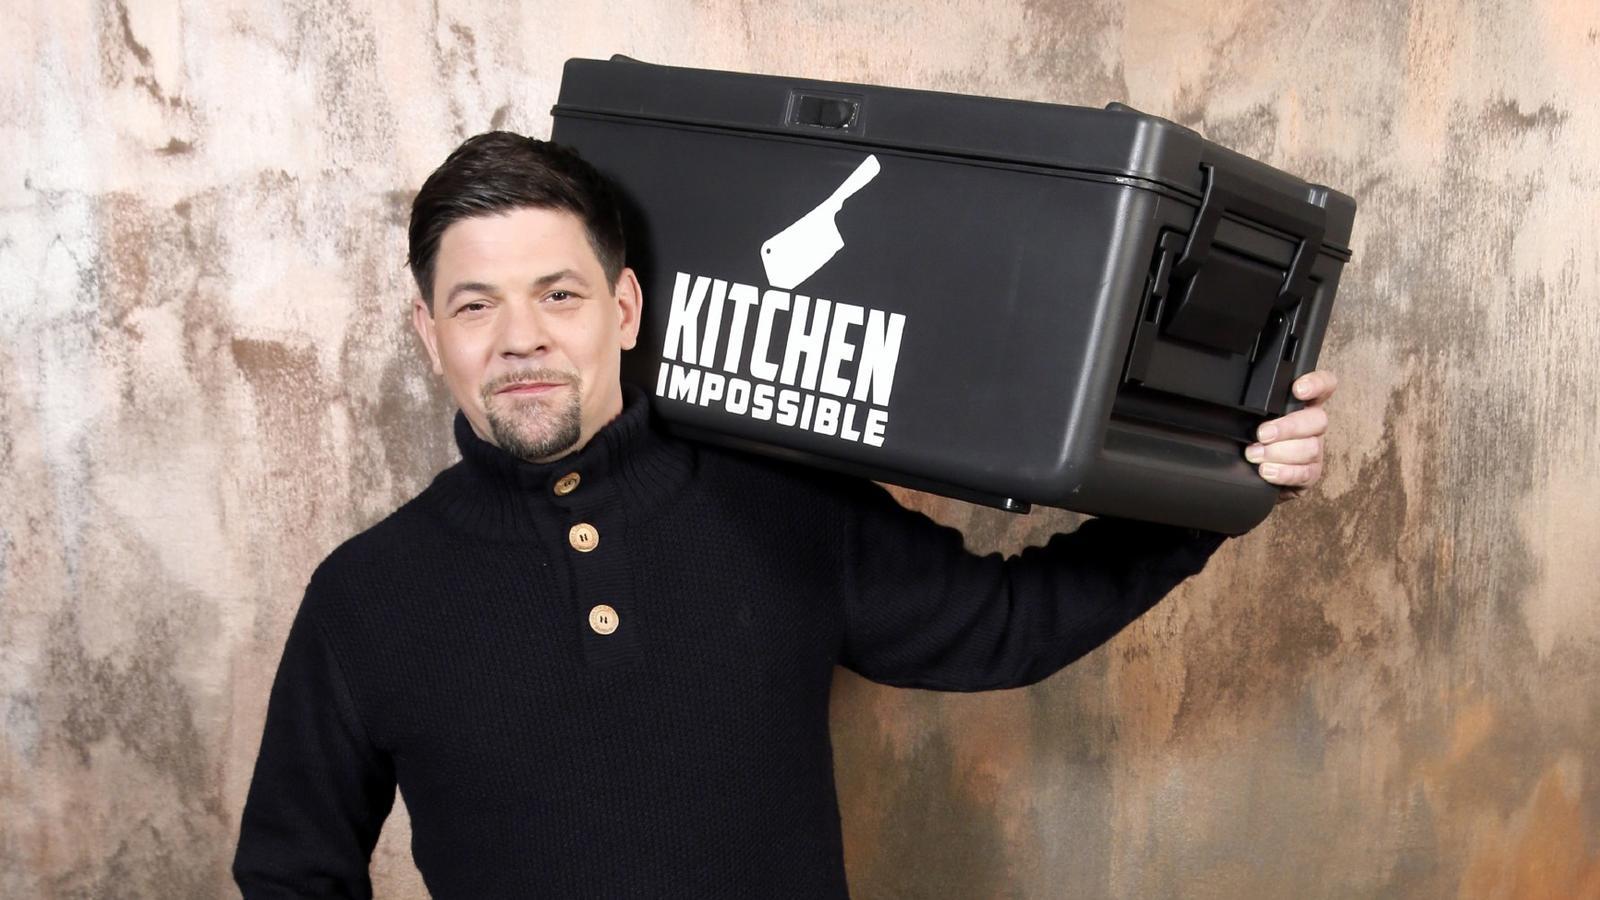 Vox Kitchen Impossible